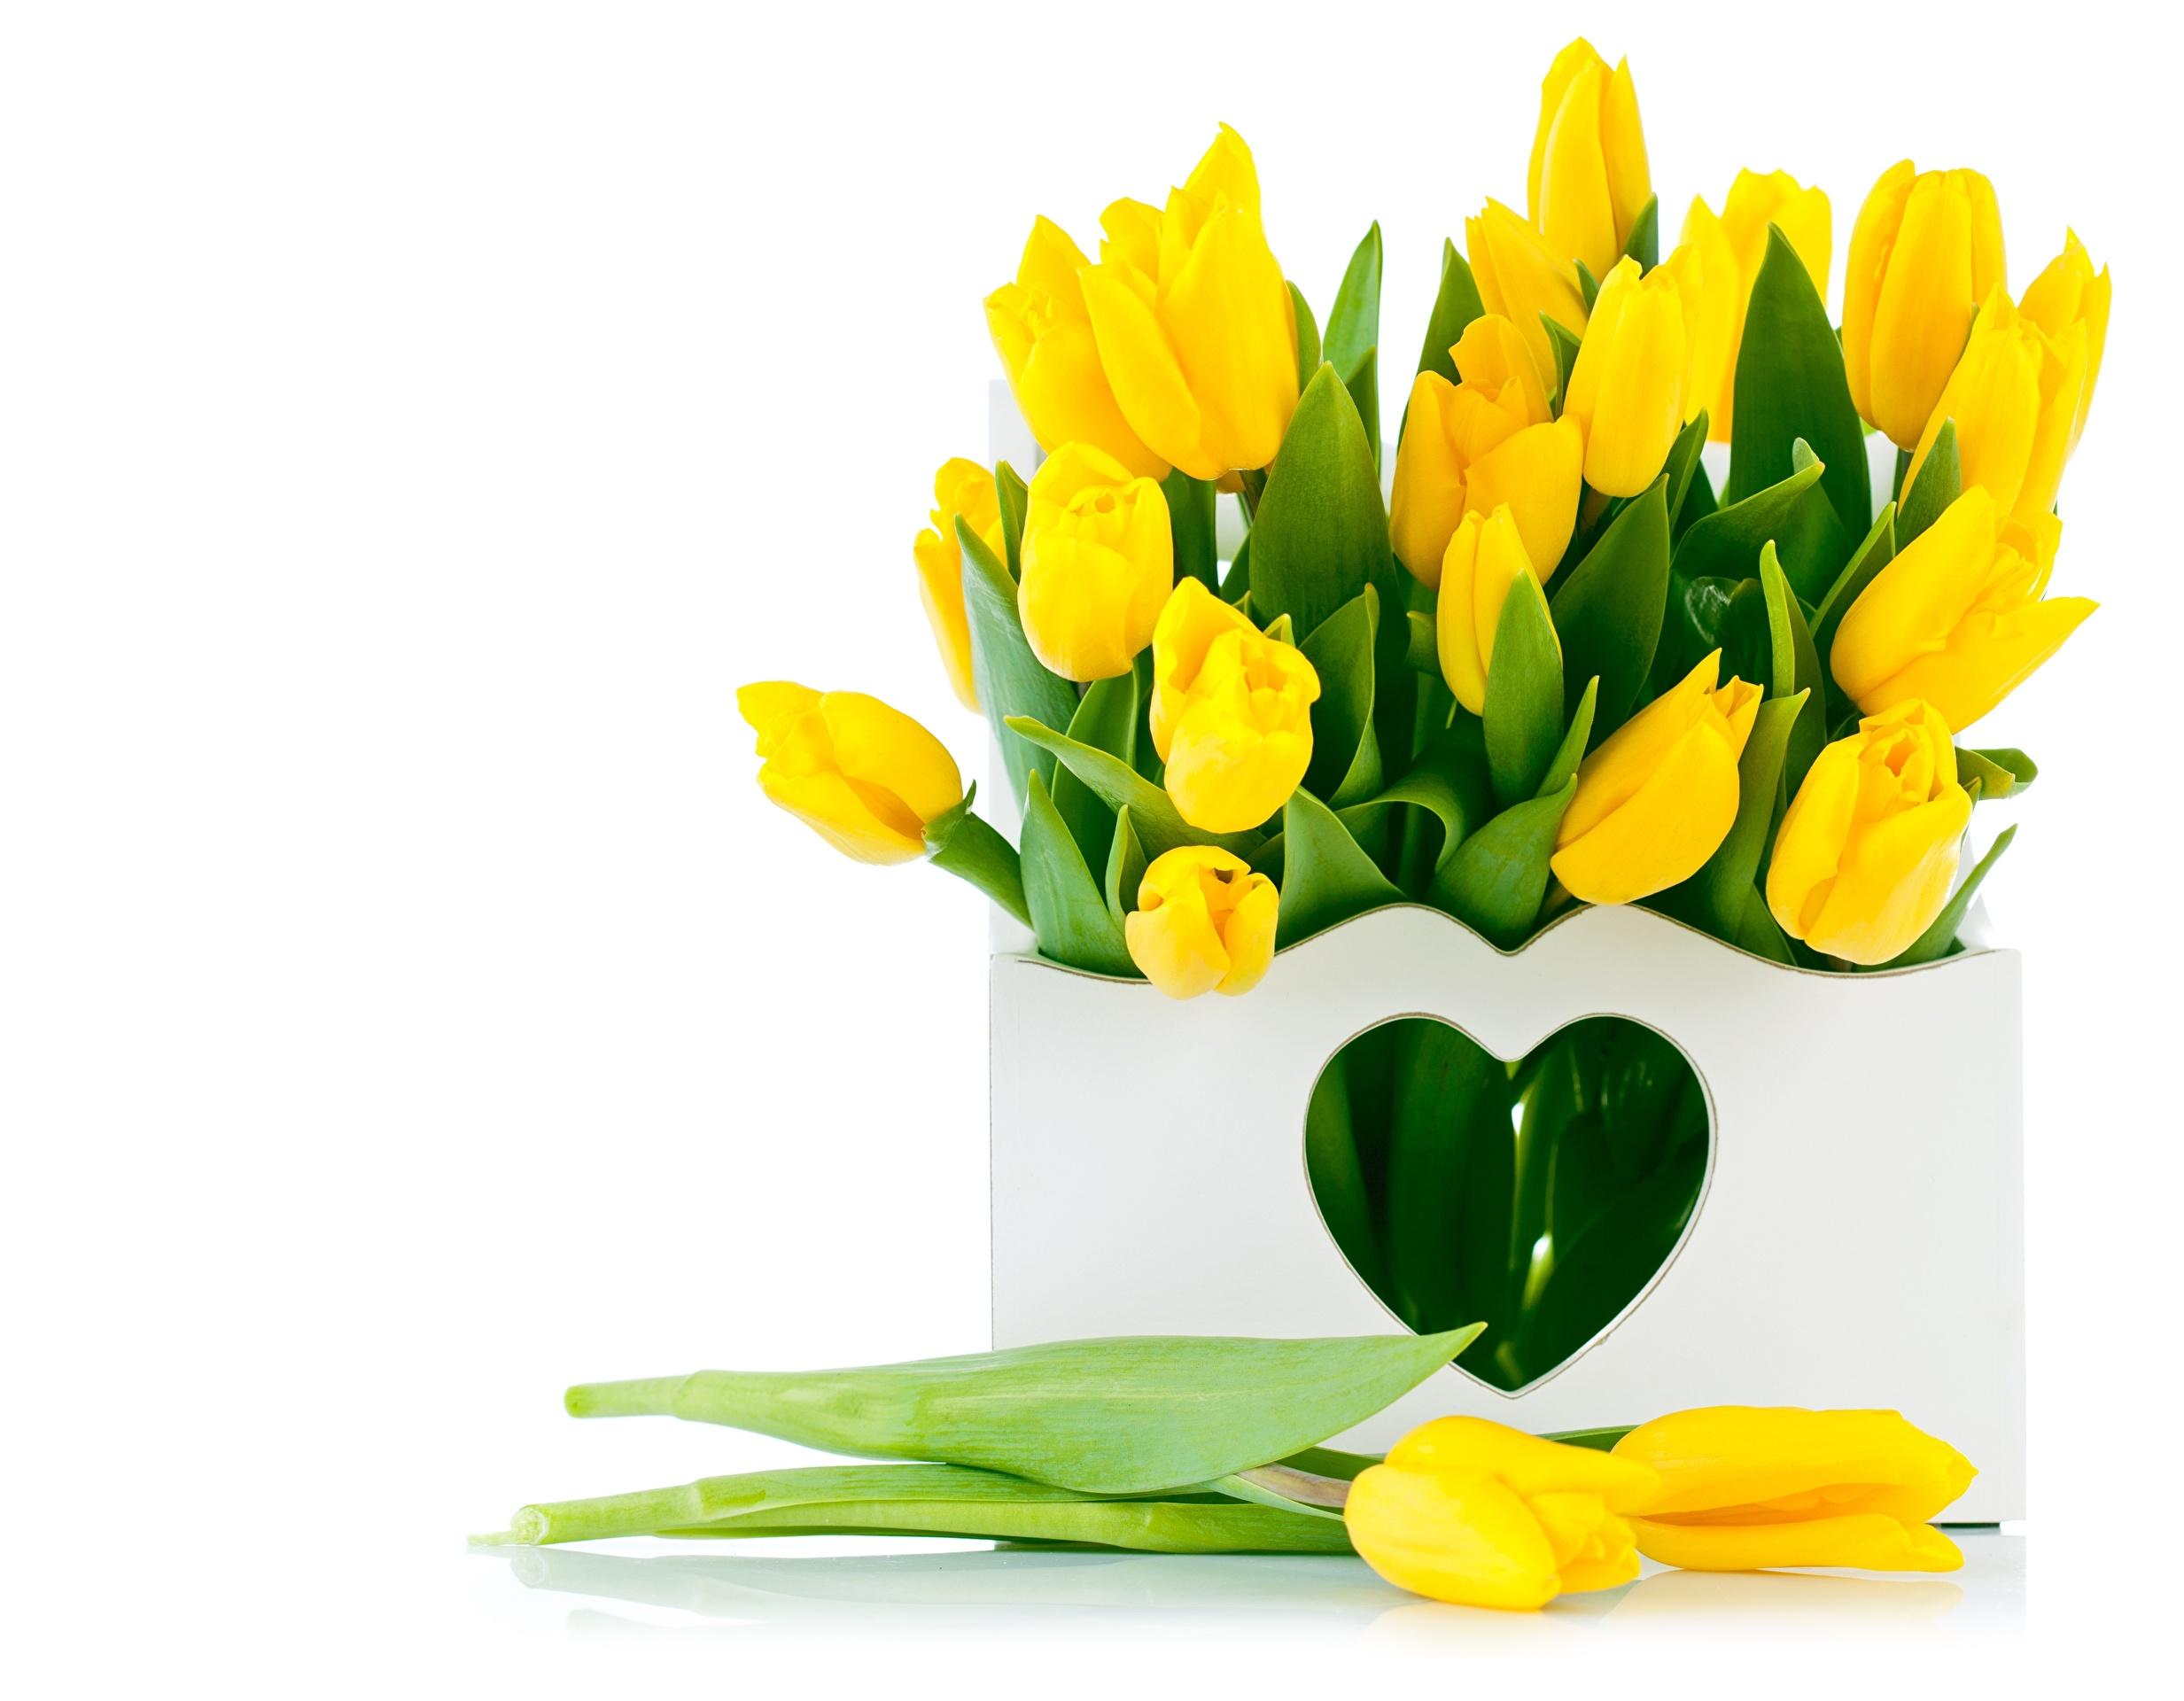 Желтые цветы тюльпаны